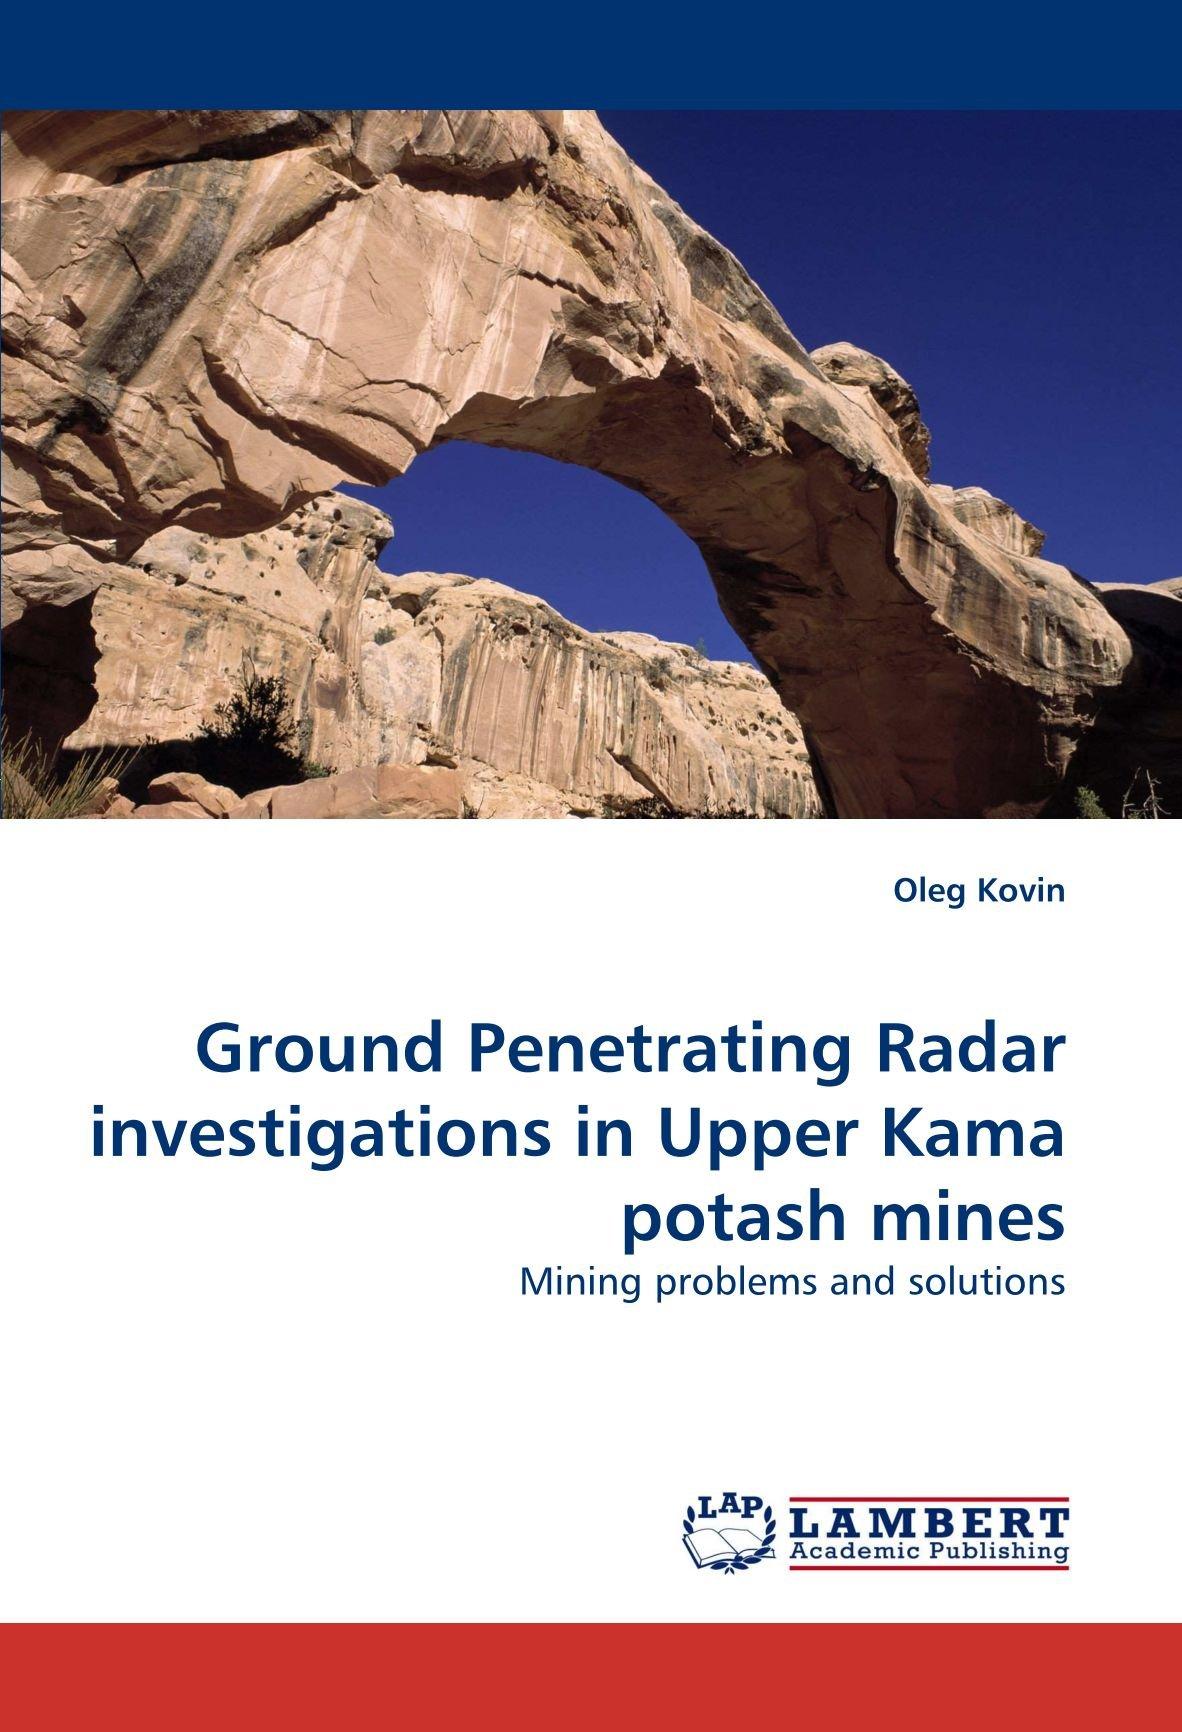 Ground Penetrating Radar investigations in Upper Kama potash